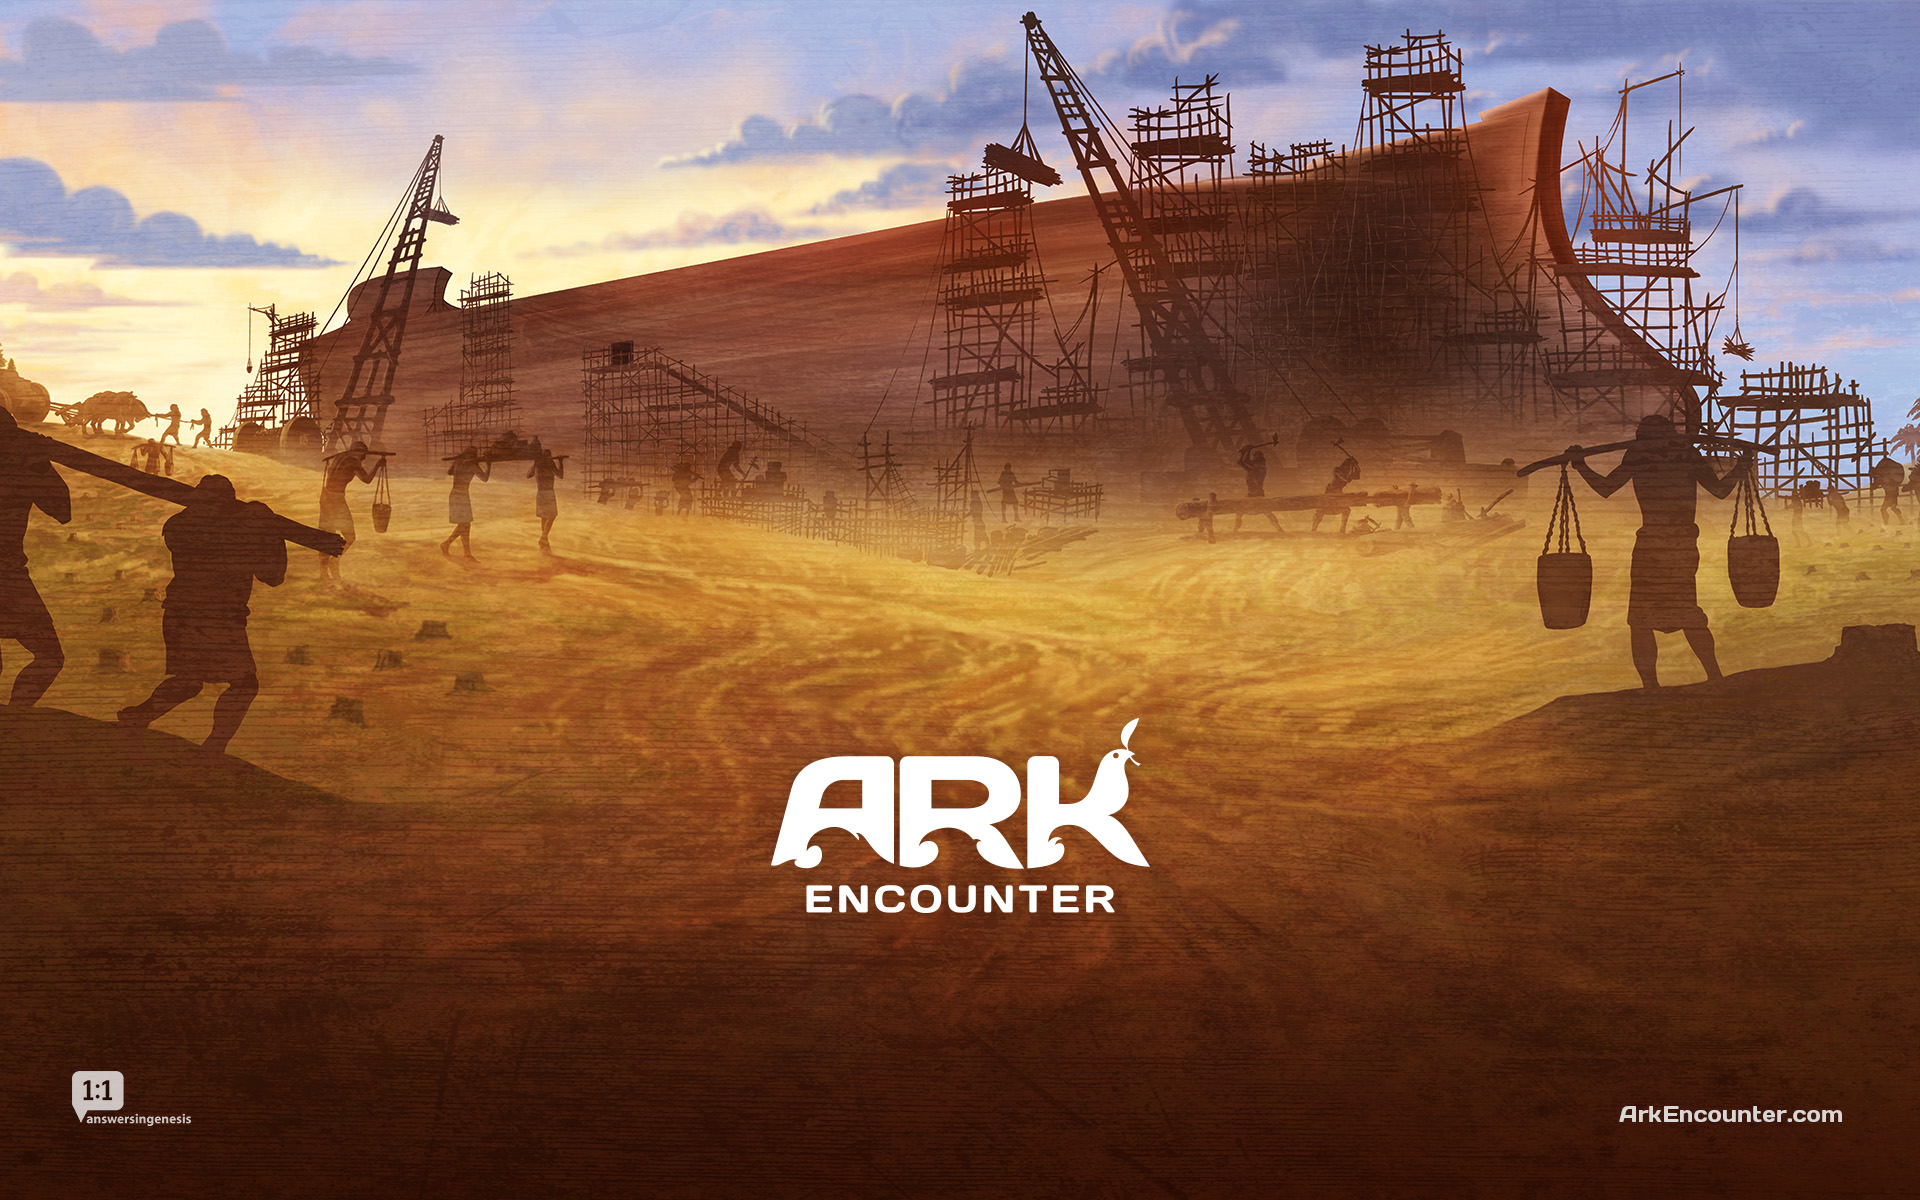 https://cdn-assets.arkencounter.com/img/gallery/ark-encounter-wallpaper-construction.jpg